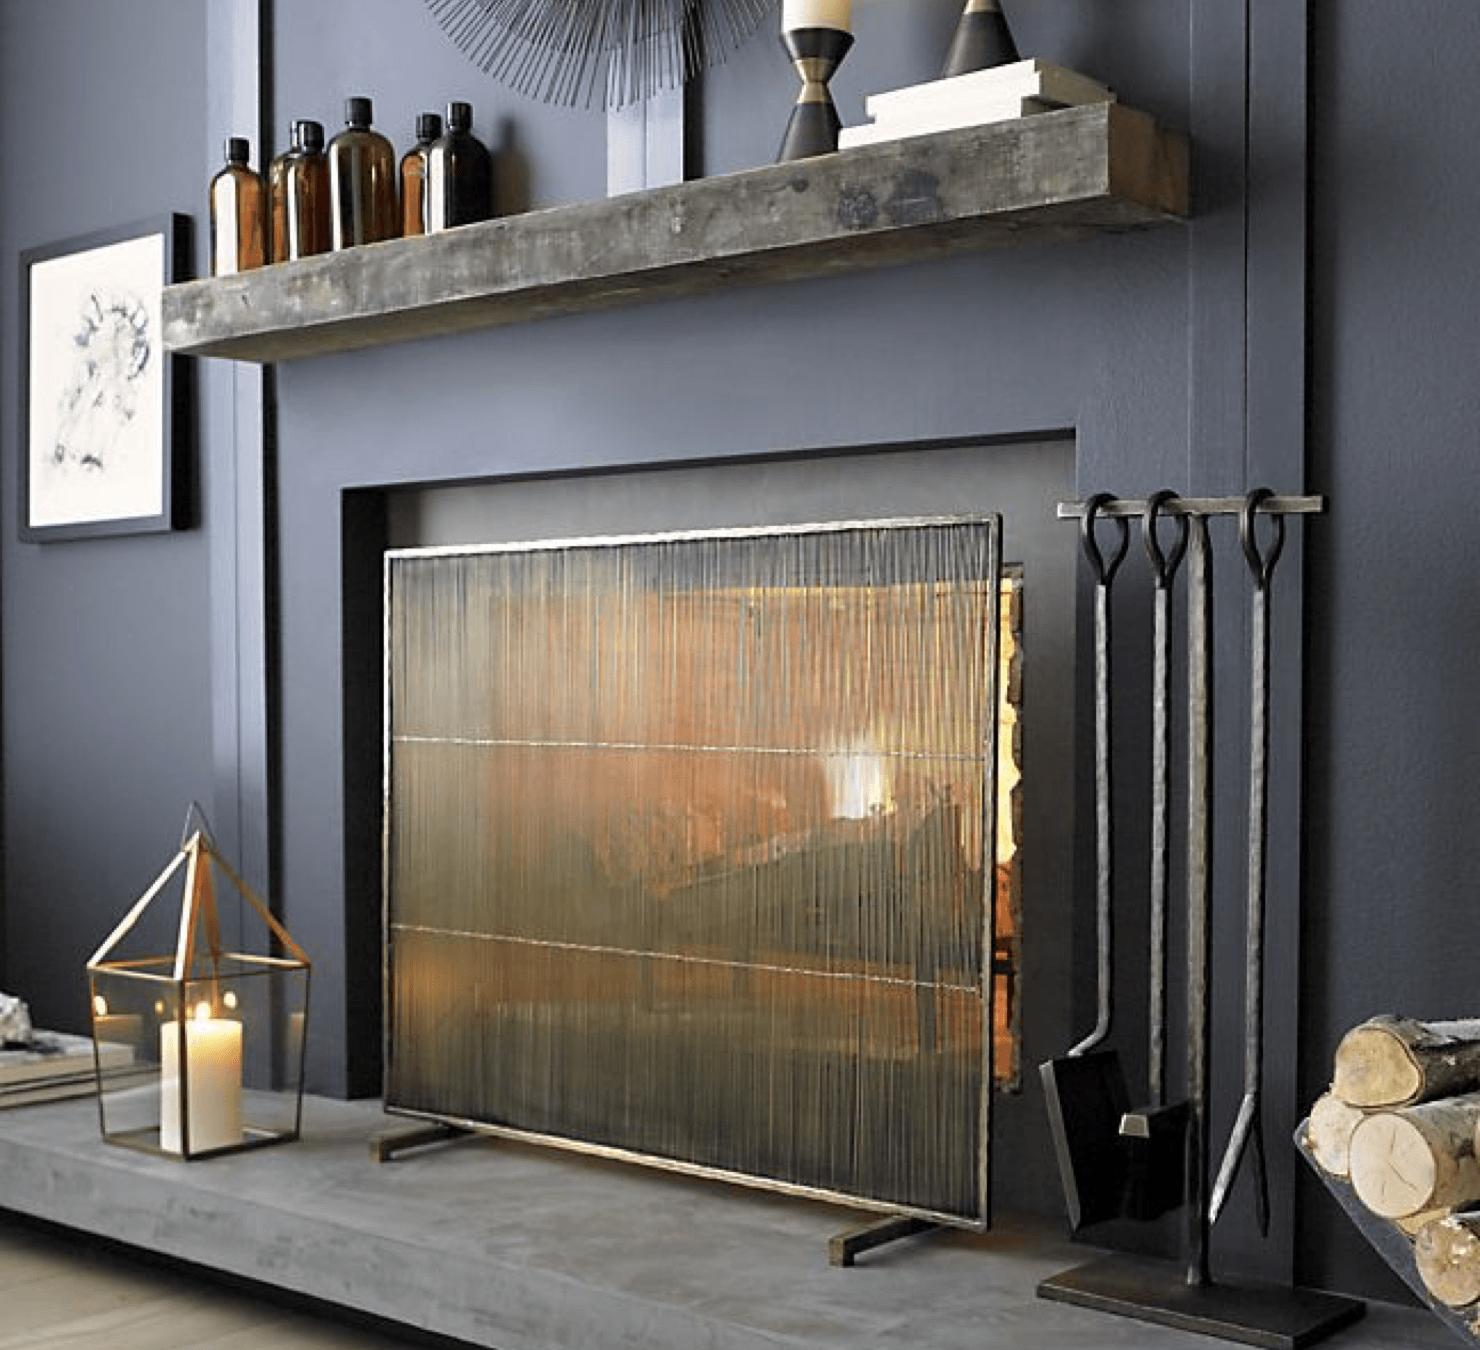 decorate-fireplace-delightful-ideas-minimalism-image.png